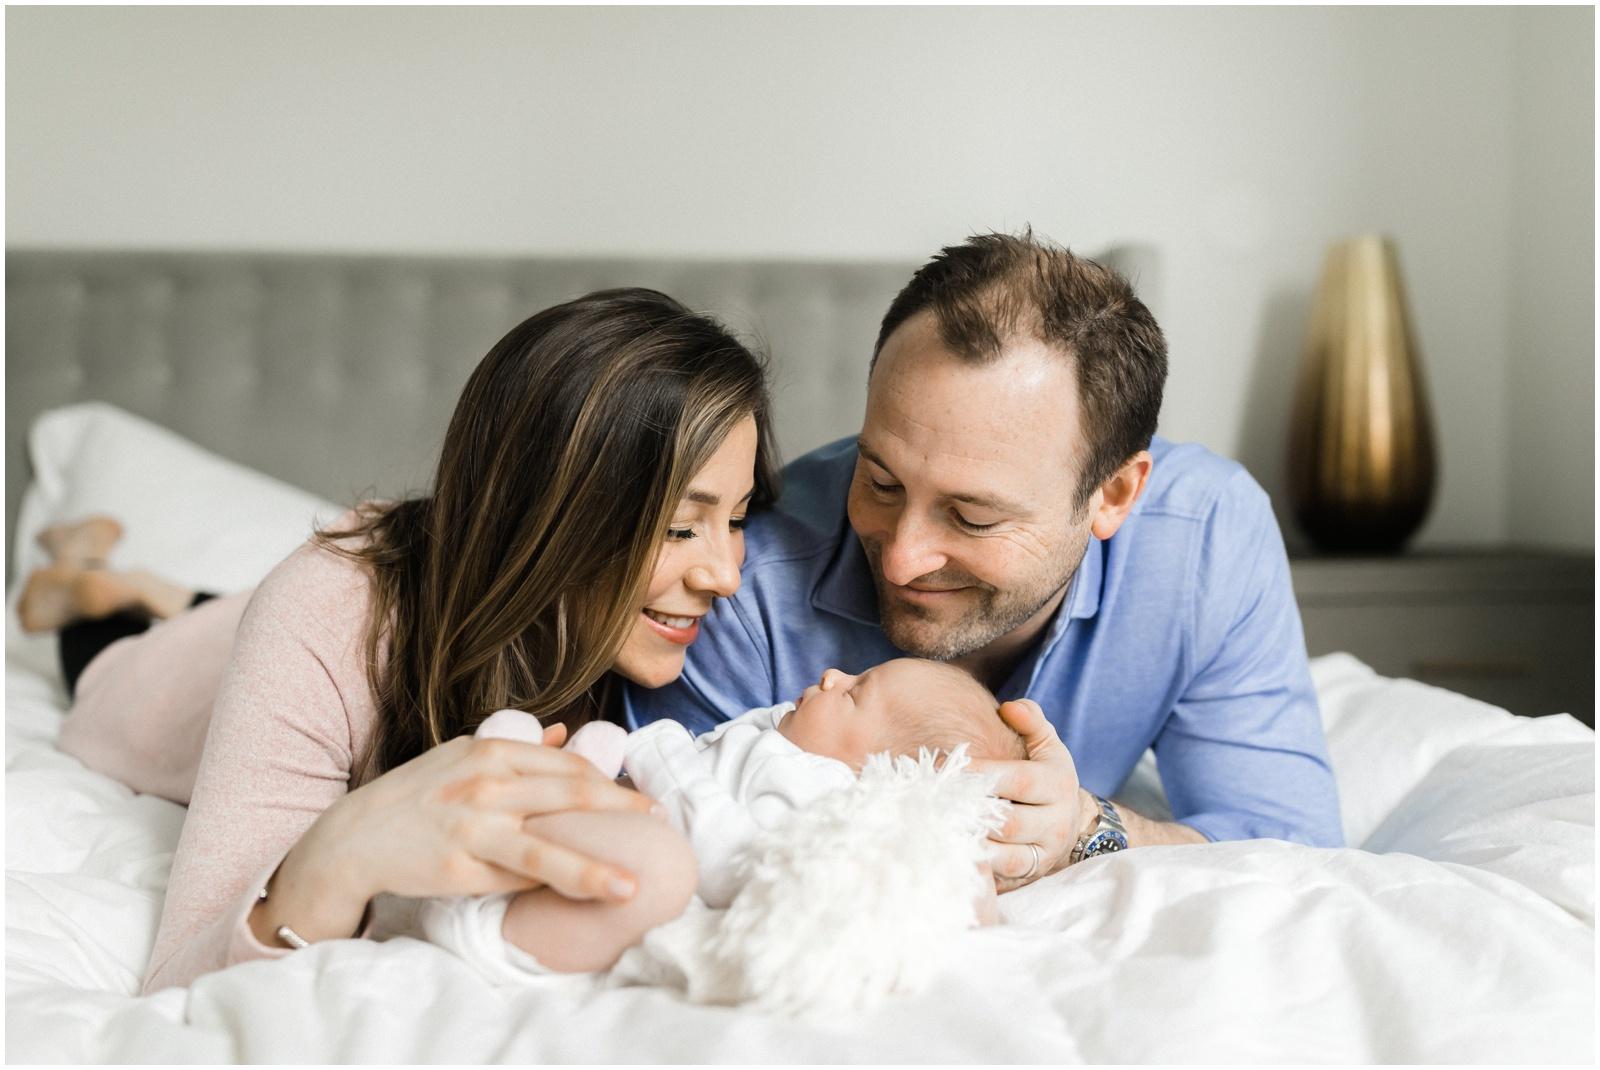 chicago-lifestyle-newborn-pregnancy-photographer-jenny-grimm-photography_0006.jpg